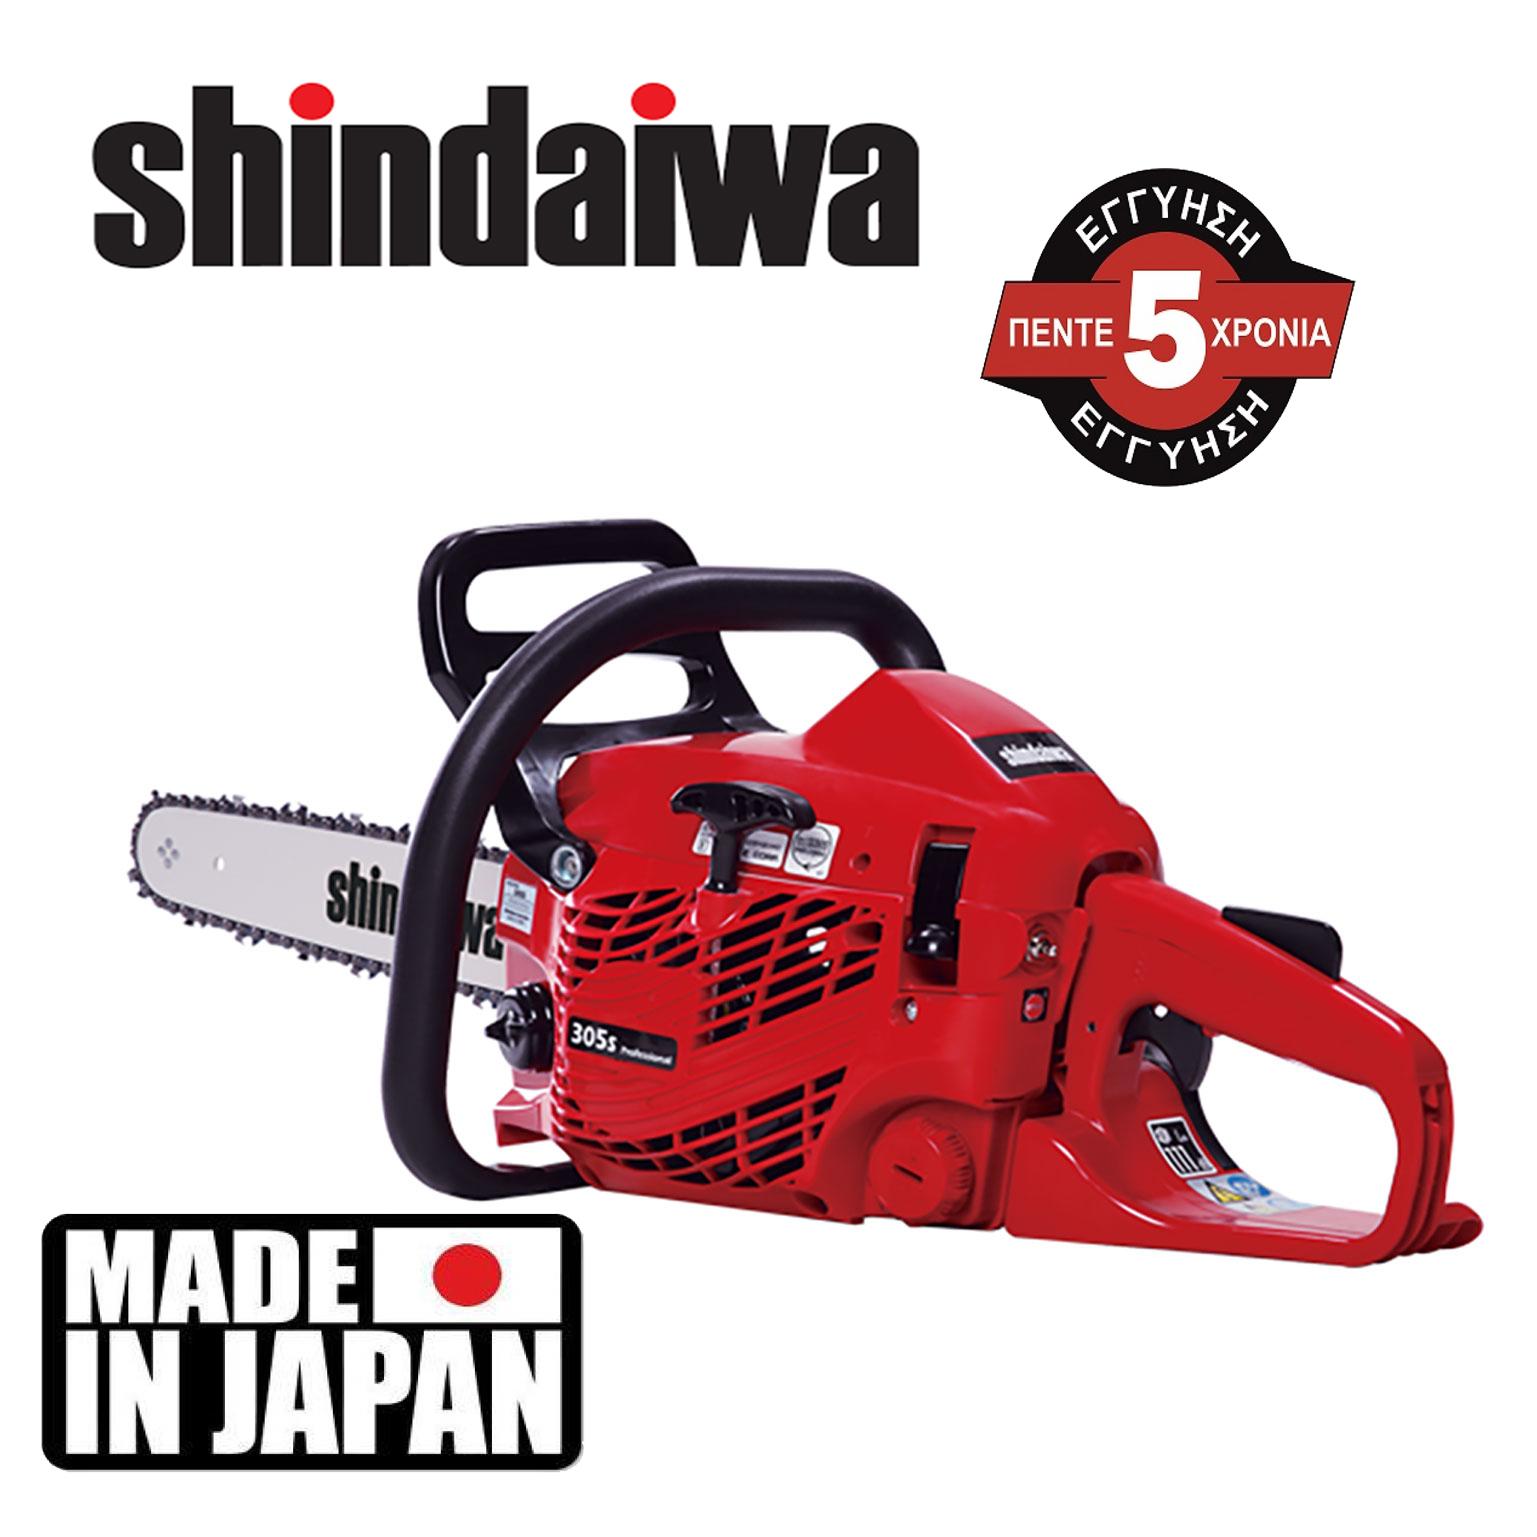 CHAINSAW Shindaiwa 305s 30cm OFFERS